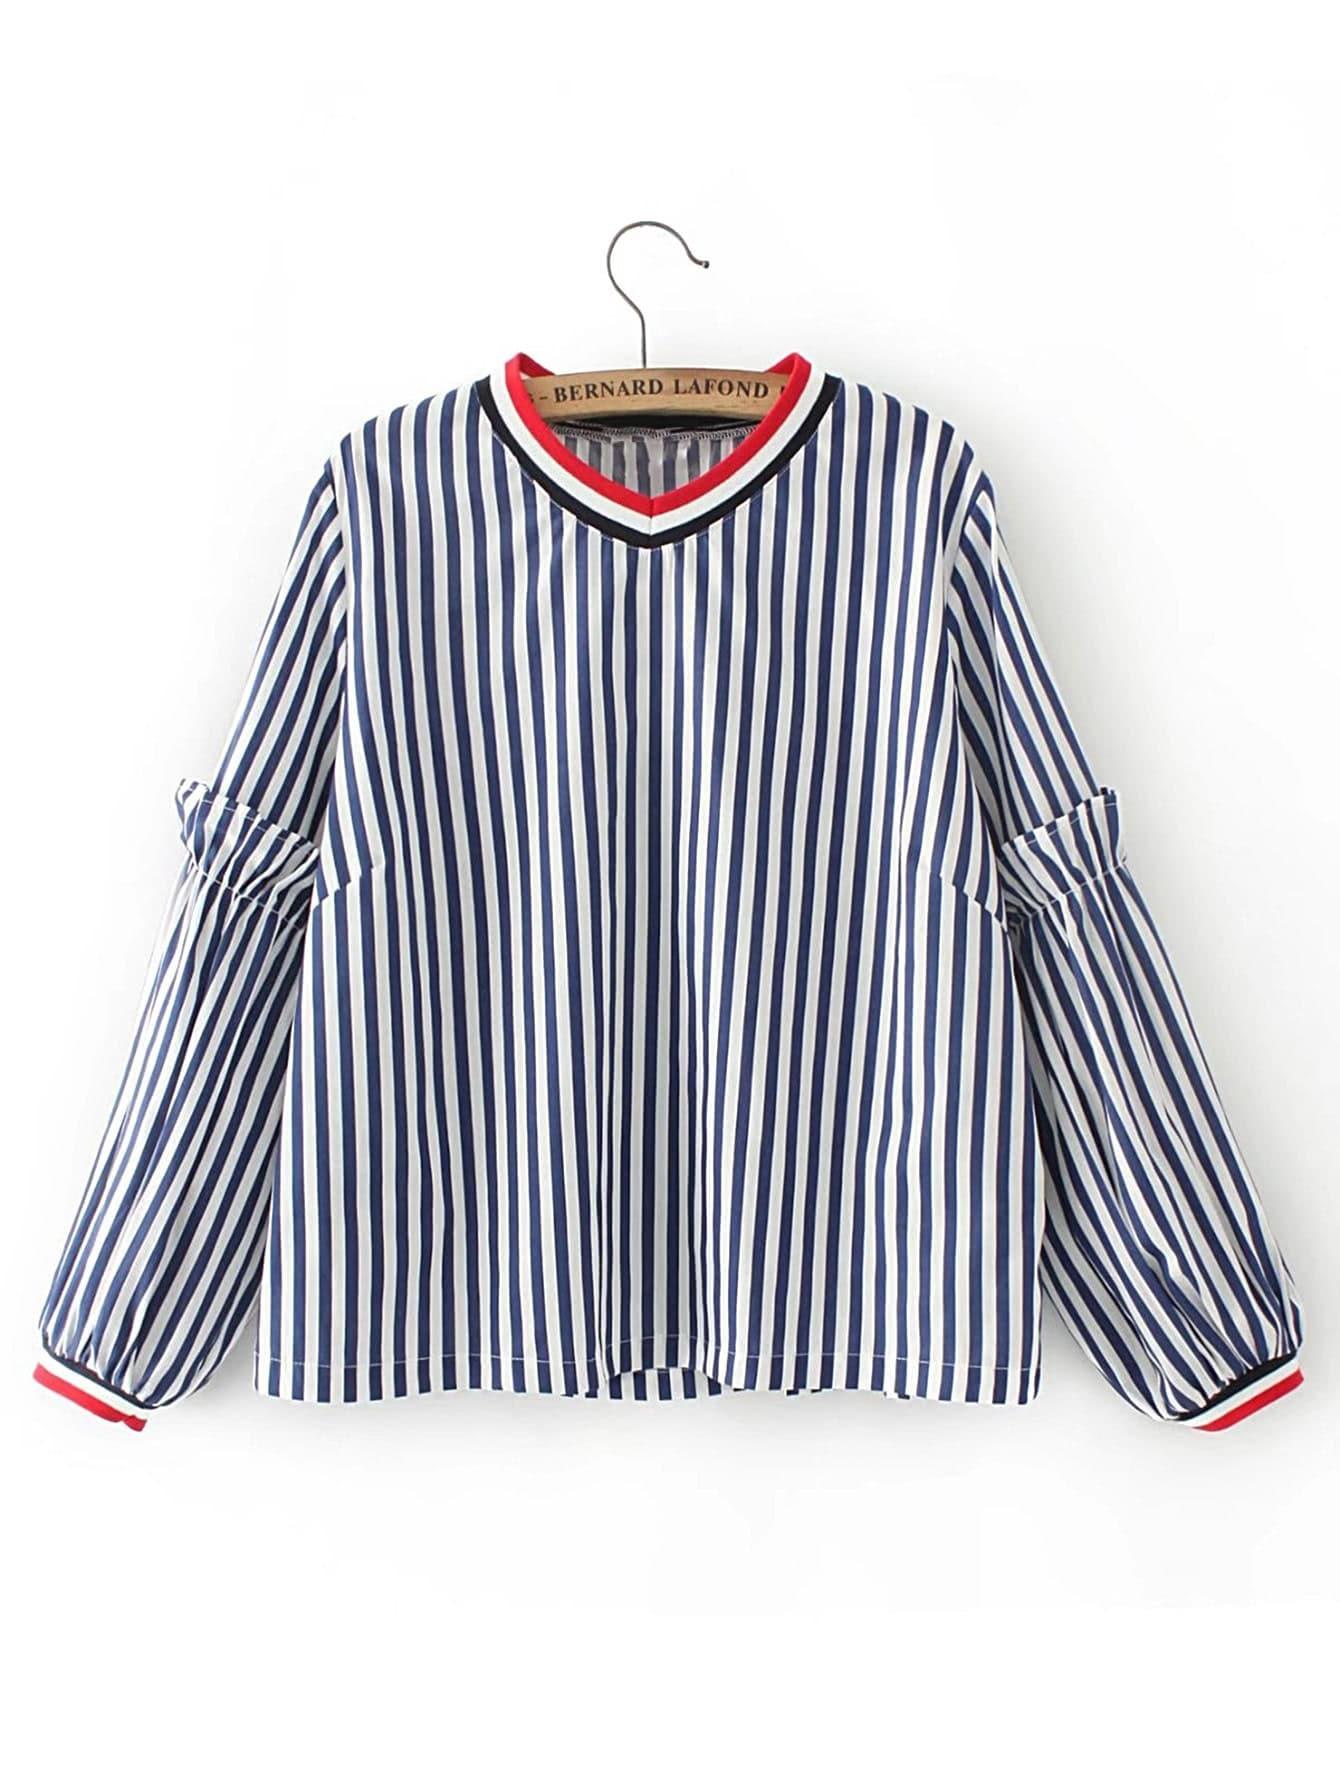 Lantern Sleeve Vertical Striped Top blouse170705201